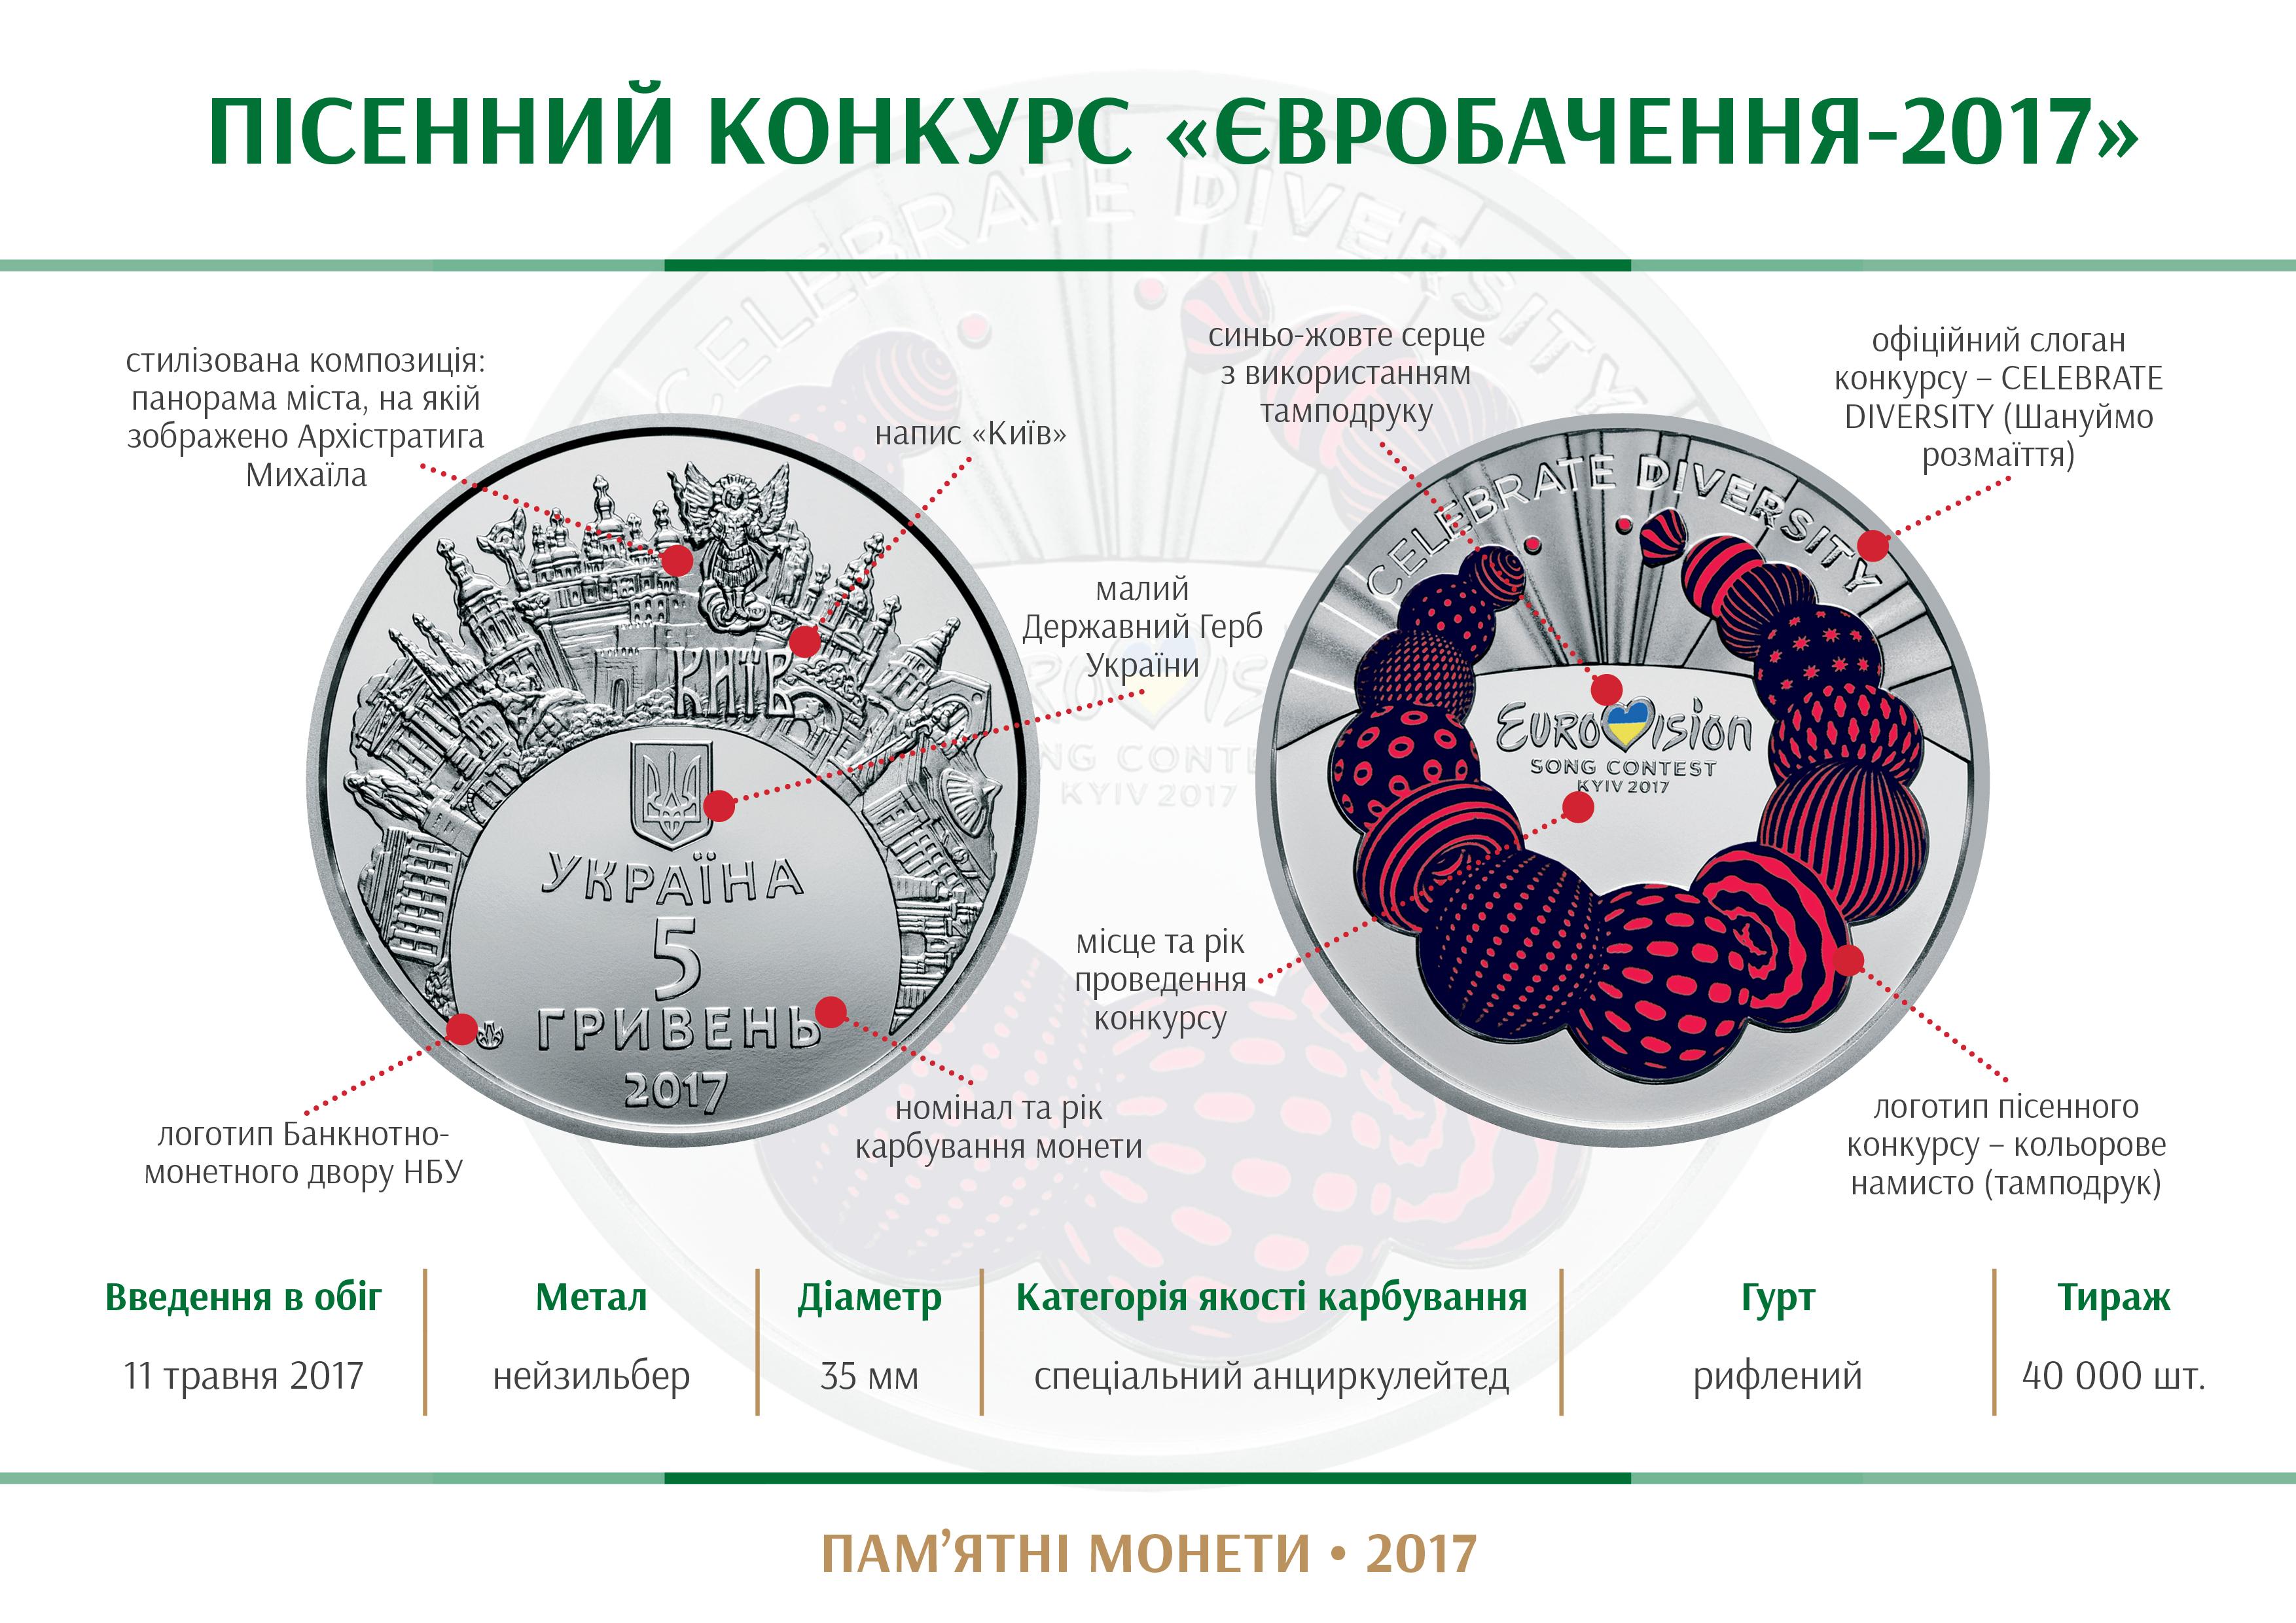 Pisennyj konkurs «Jevrobachennja-2017»